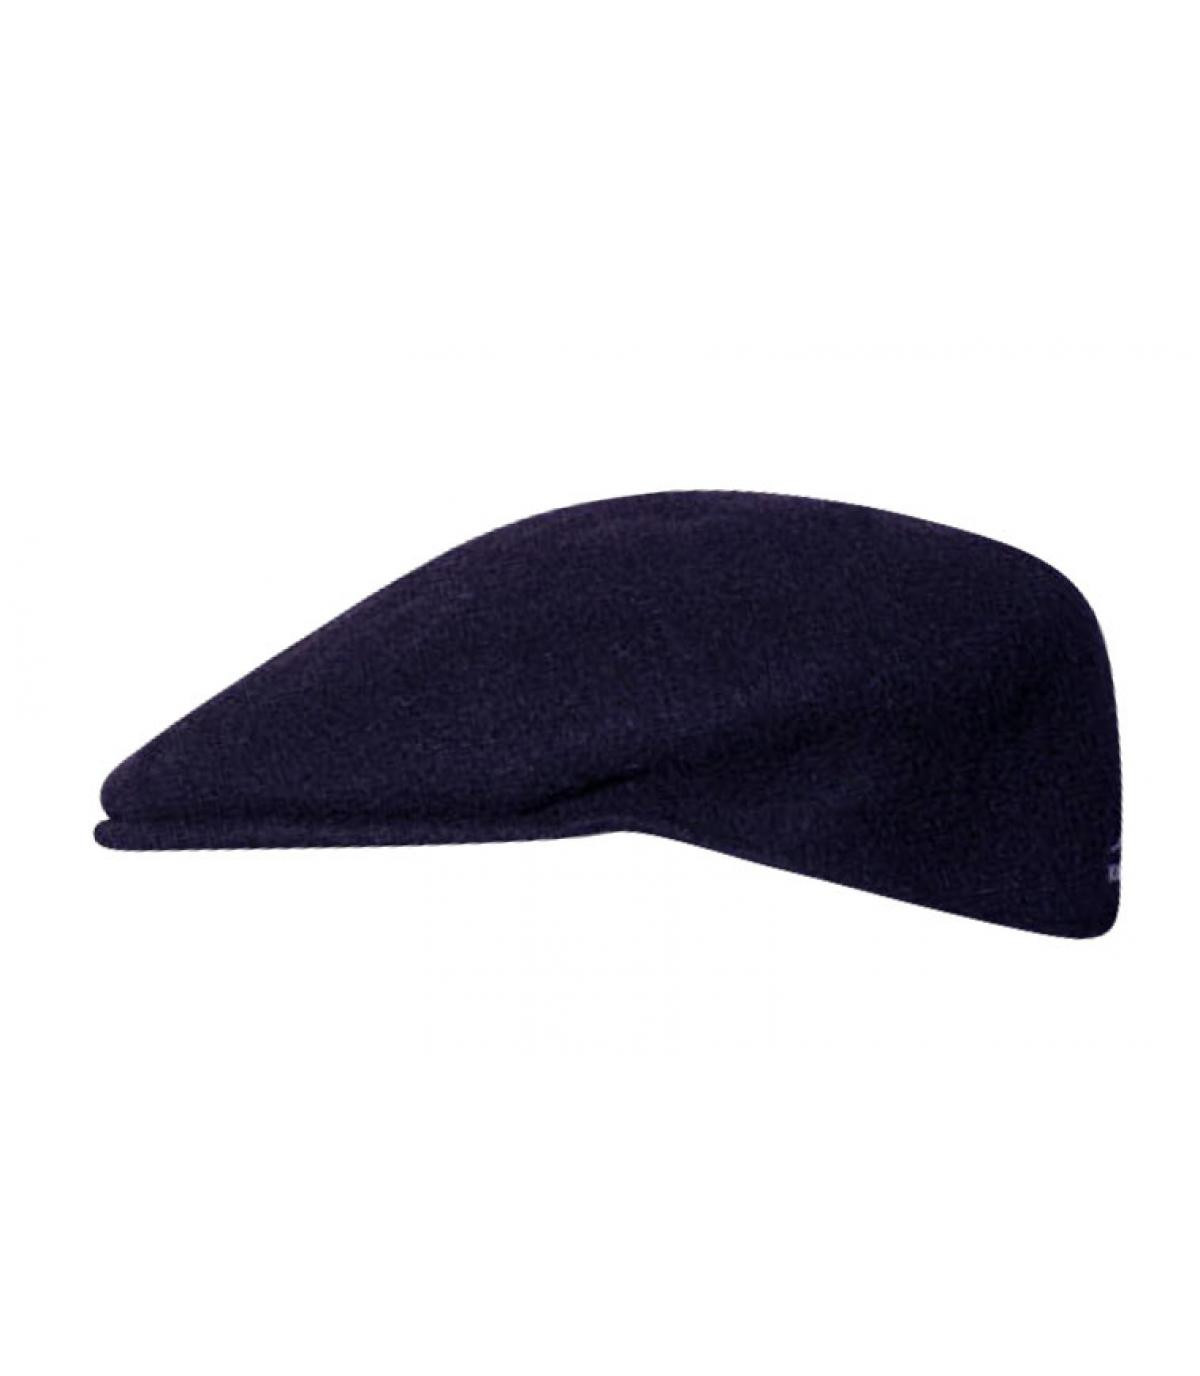 504 wool navy